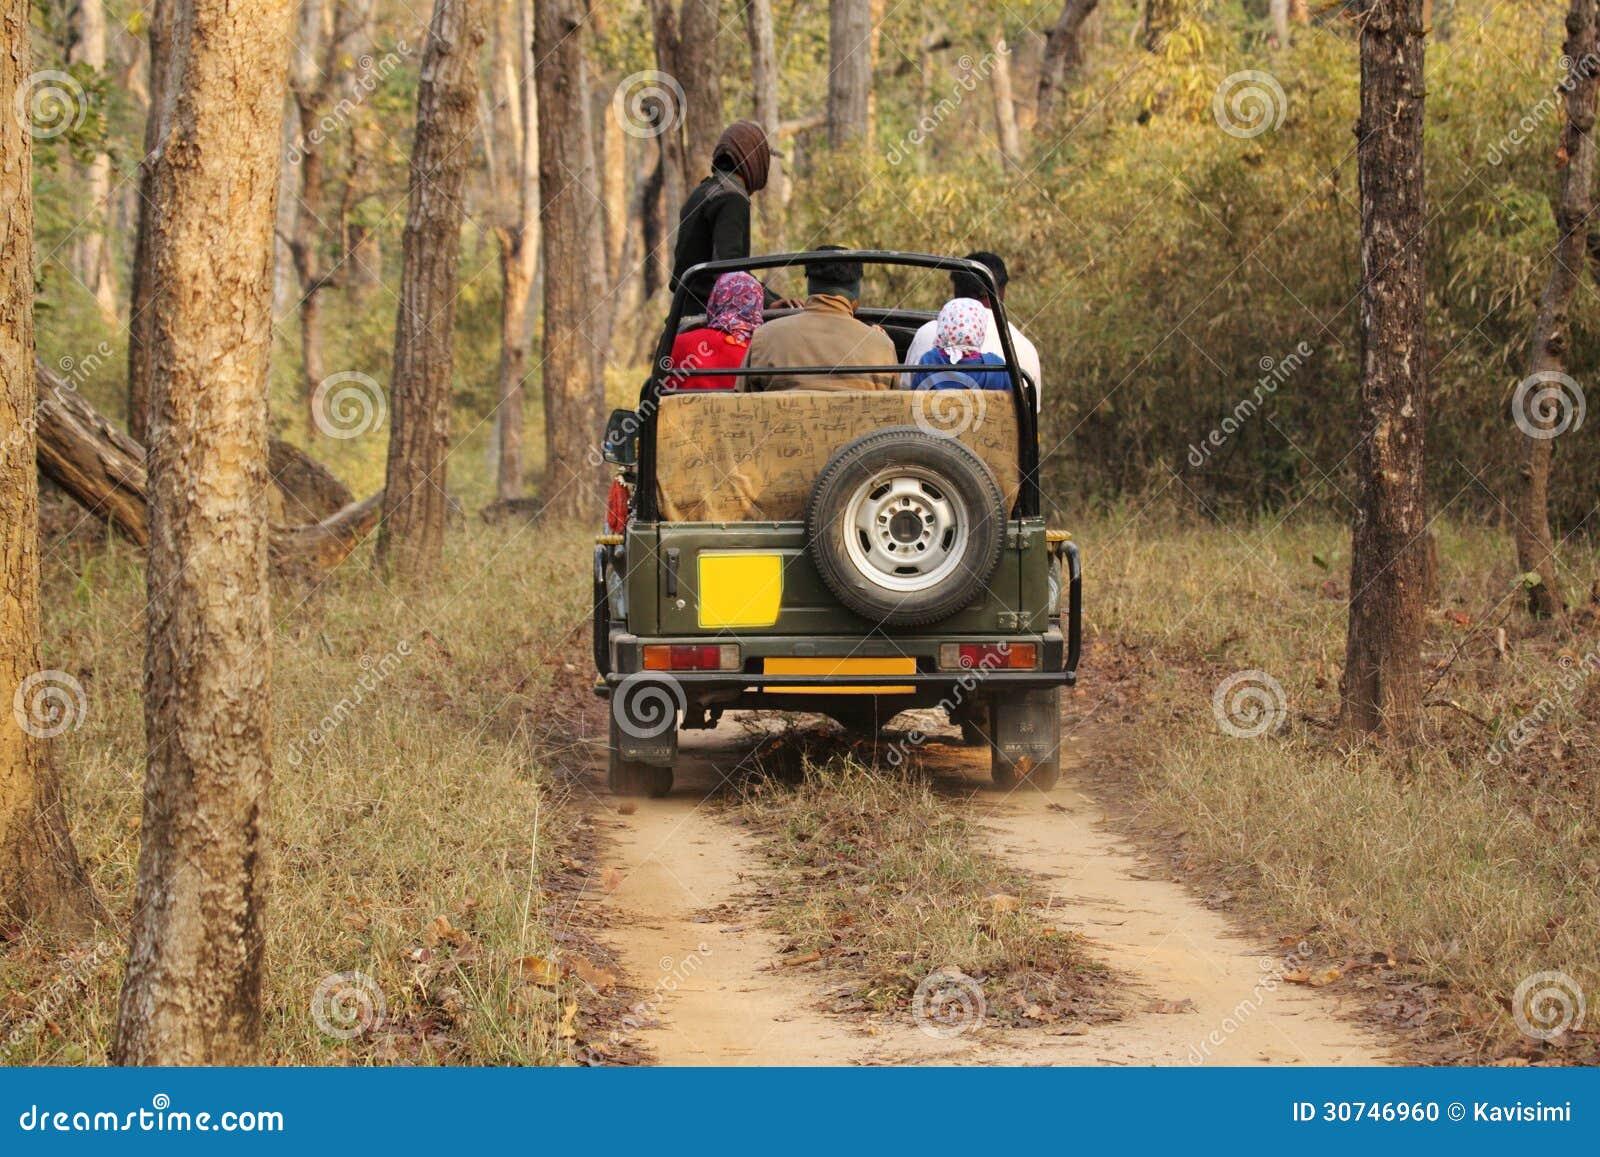 Safari dżip w głębokim lesie